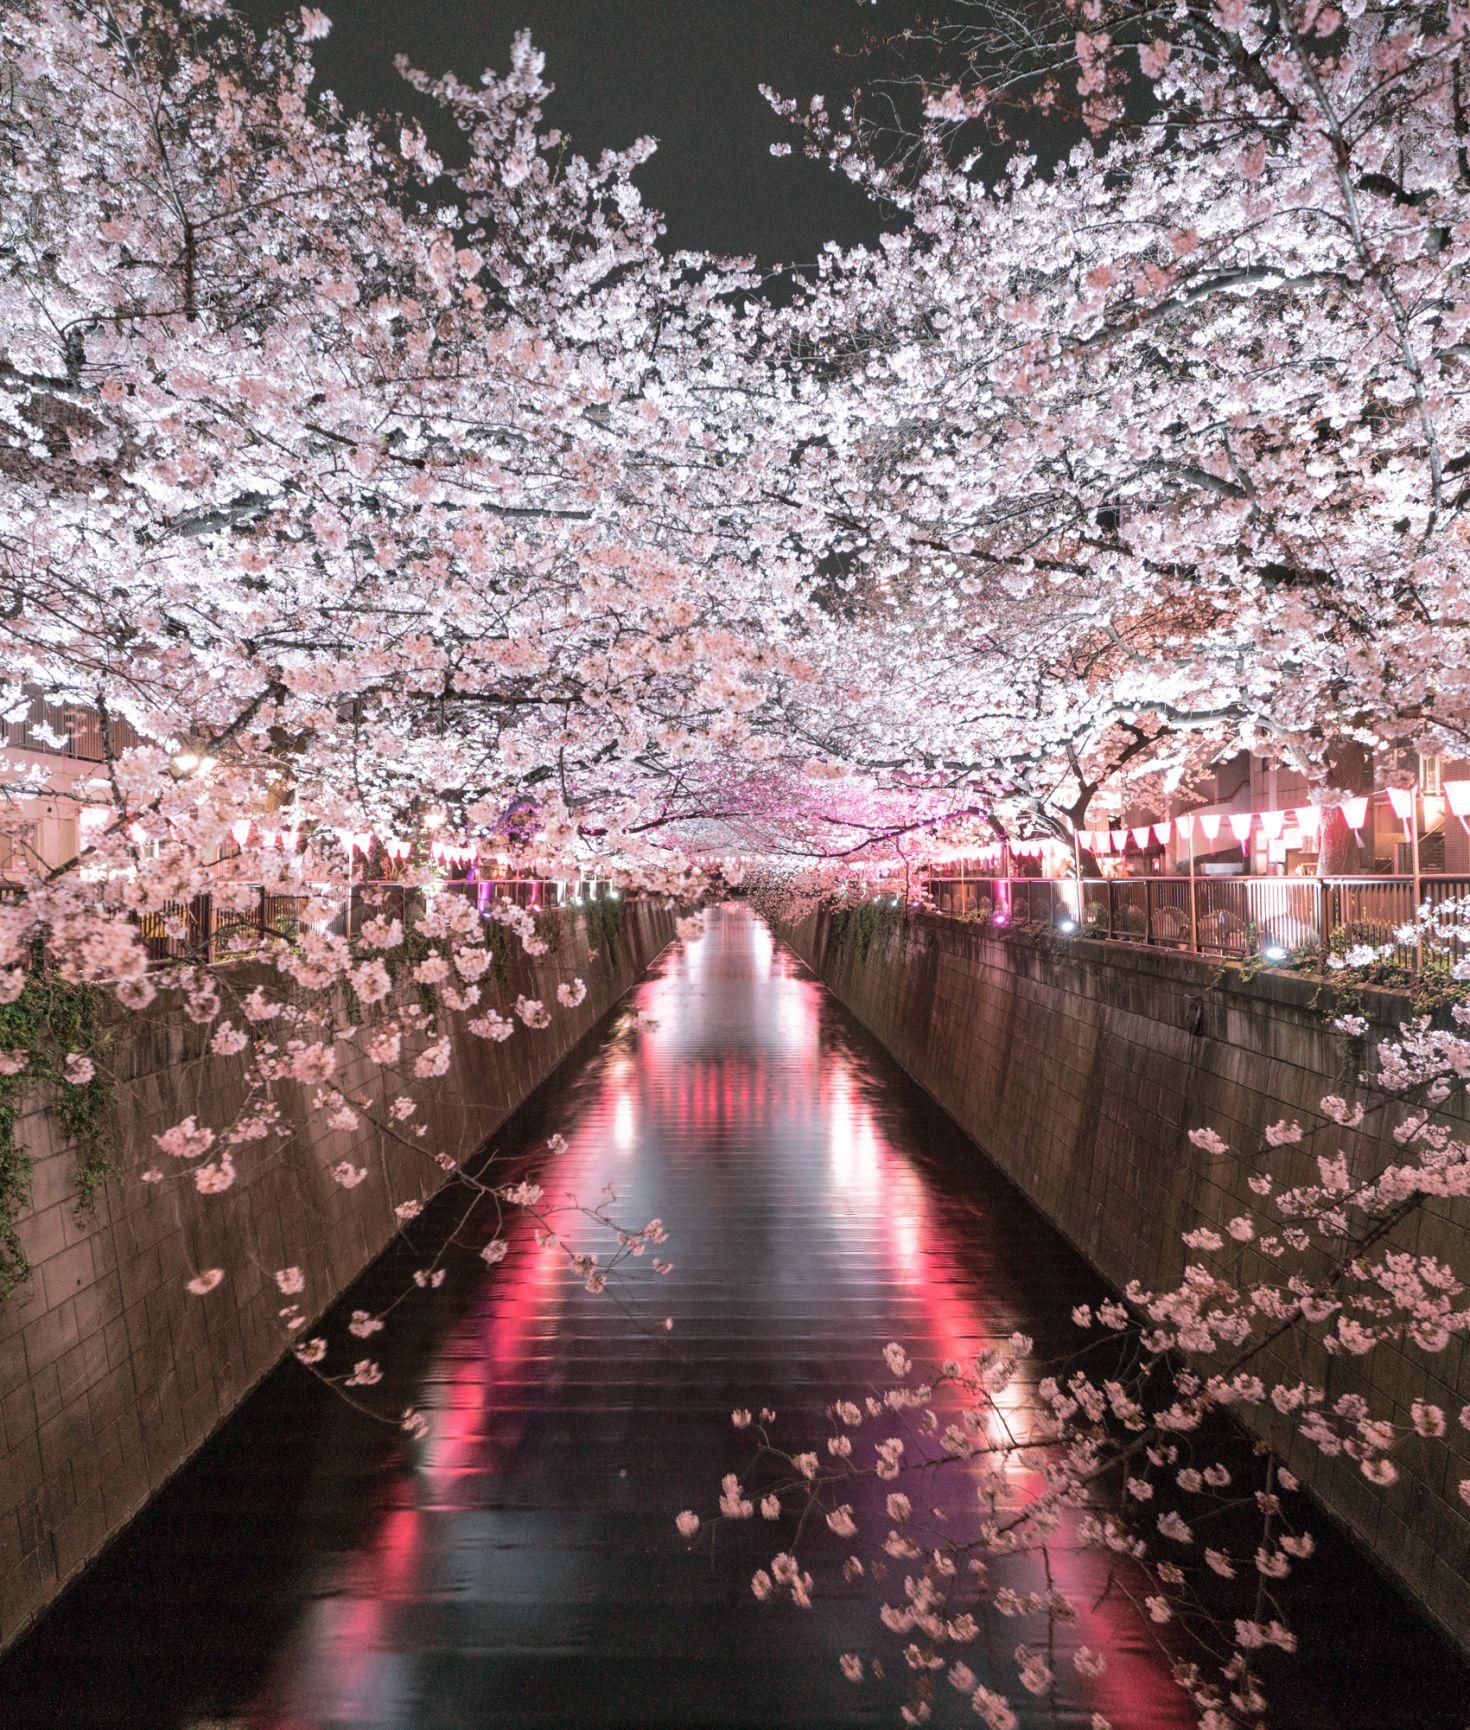 Flow Art Station Bloom Cherry Tree Flow Art Station Hanami Japan Japanese Culture Photography Sakura Cherry Blossom Japan Tokyo Cherry Pink Blossom Tree